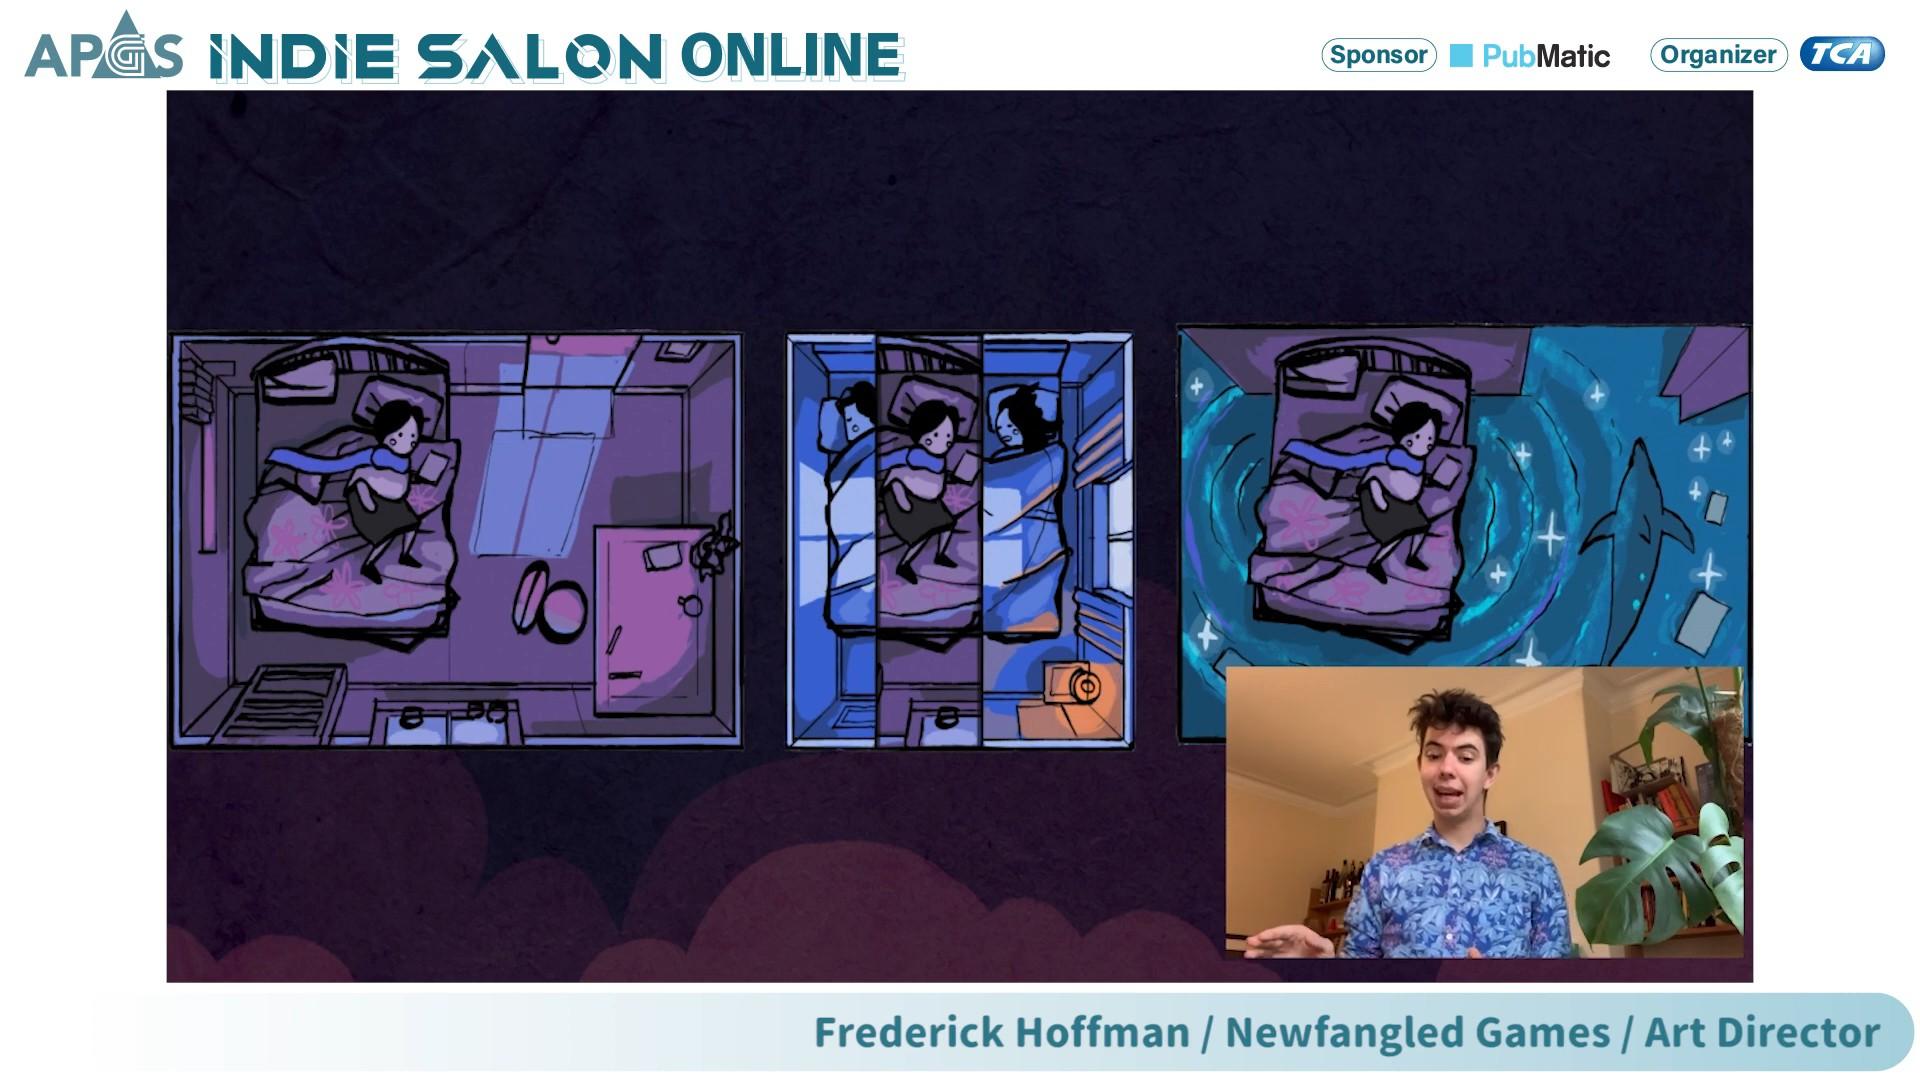 圖片03:英國Newfangled Games線上演講